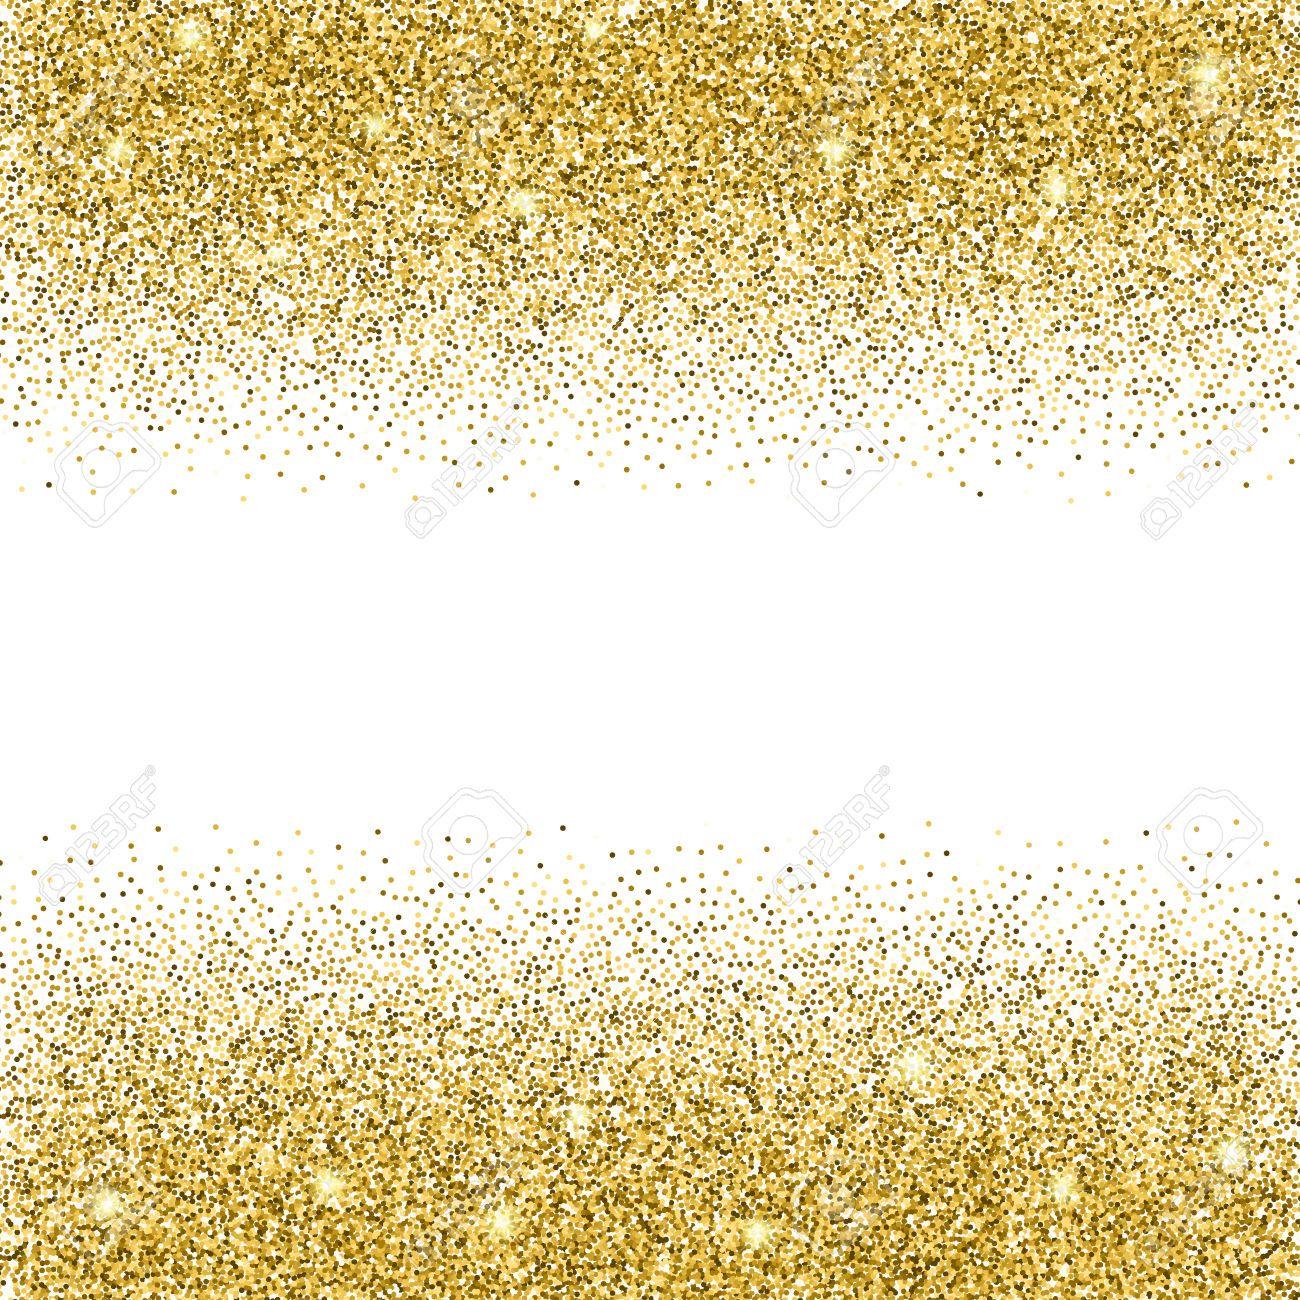 50537981 gold glitter background gold sparkles on white background 50537981 gold glitter background gold sparkles on white stopboris Images